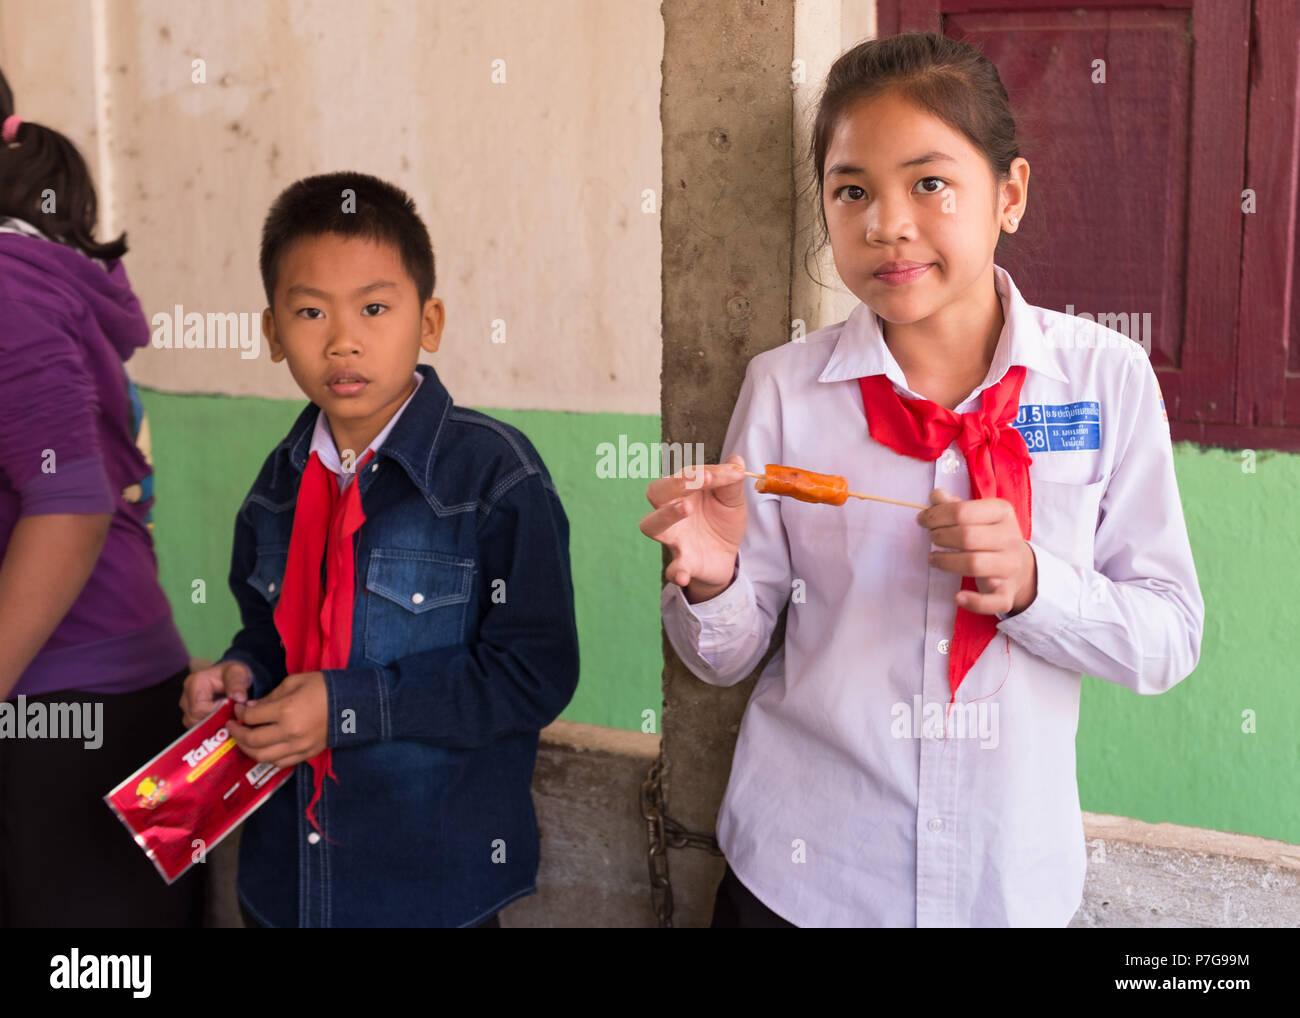 Portrait of schoolchildren eating during lunch break at school, Vientiane, Laos, Asia. - Stock Image